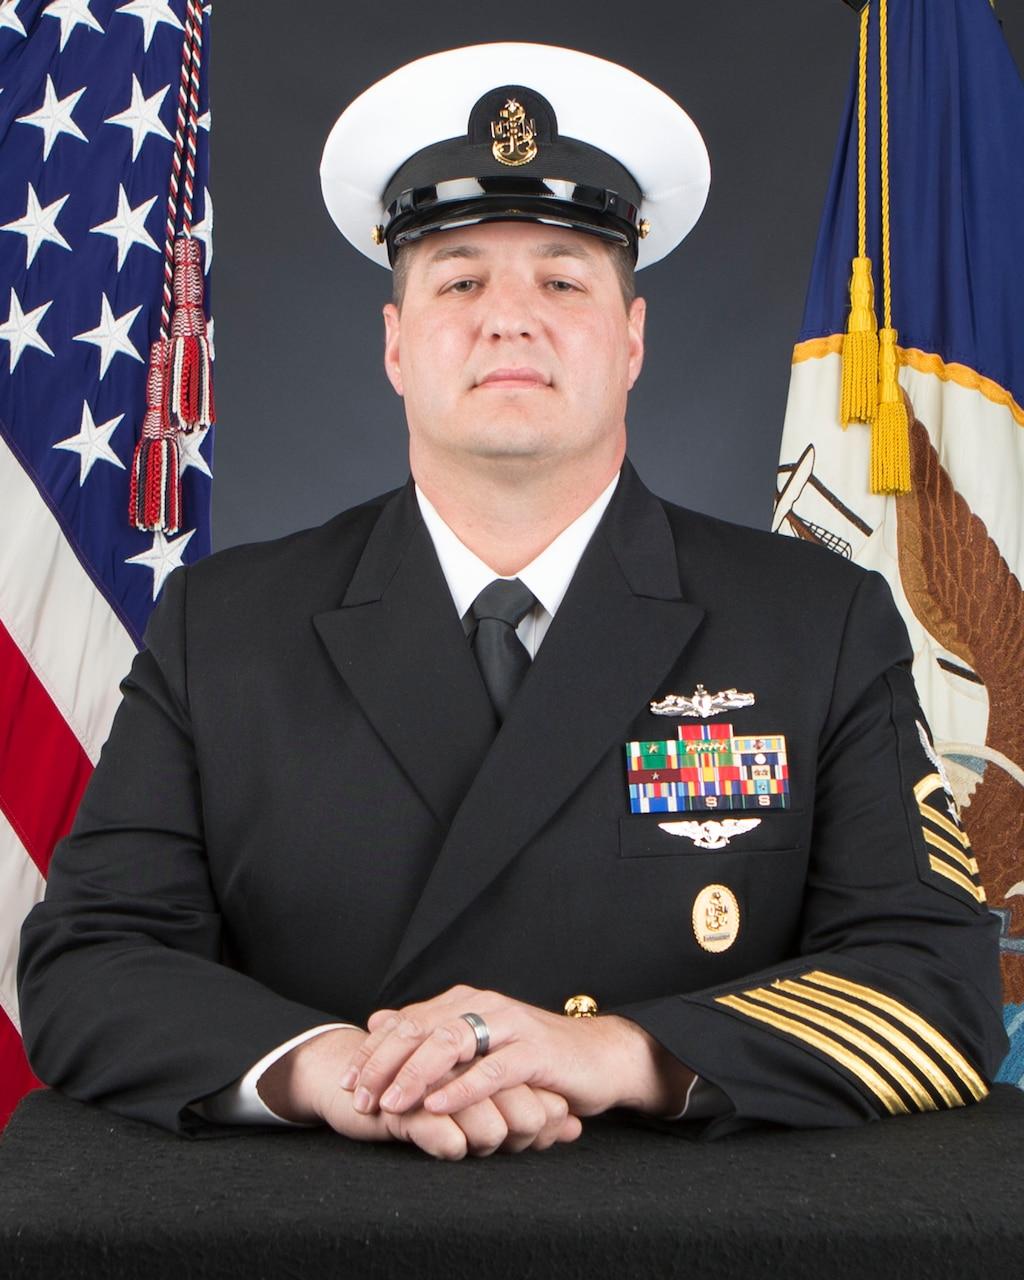 CMDCS David C. Hyatt